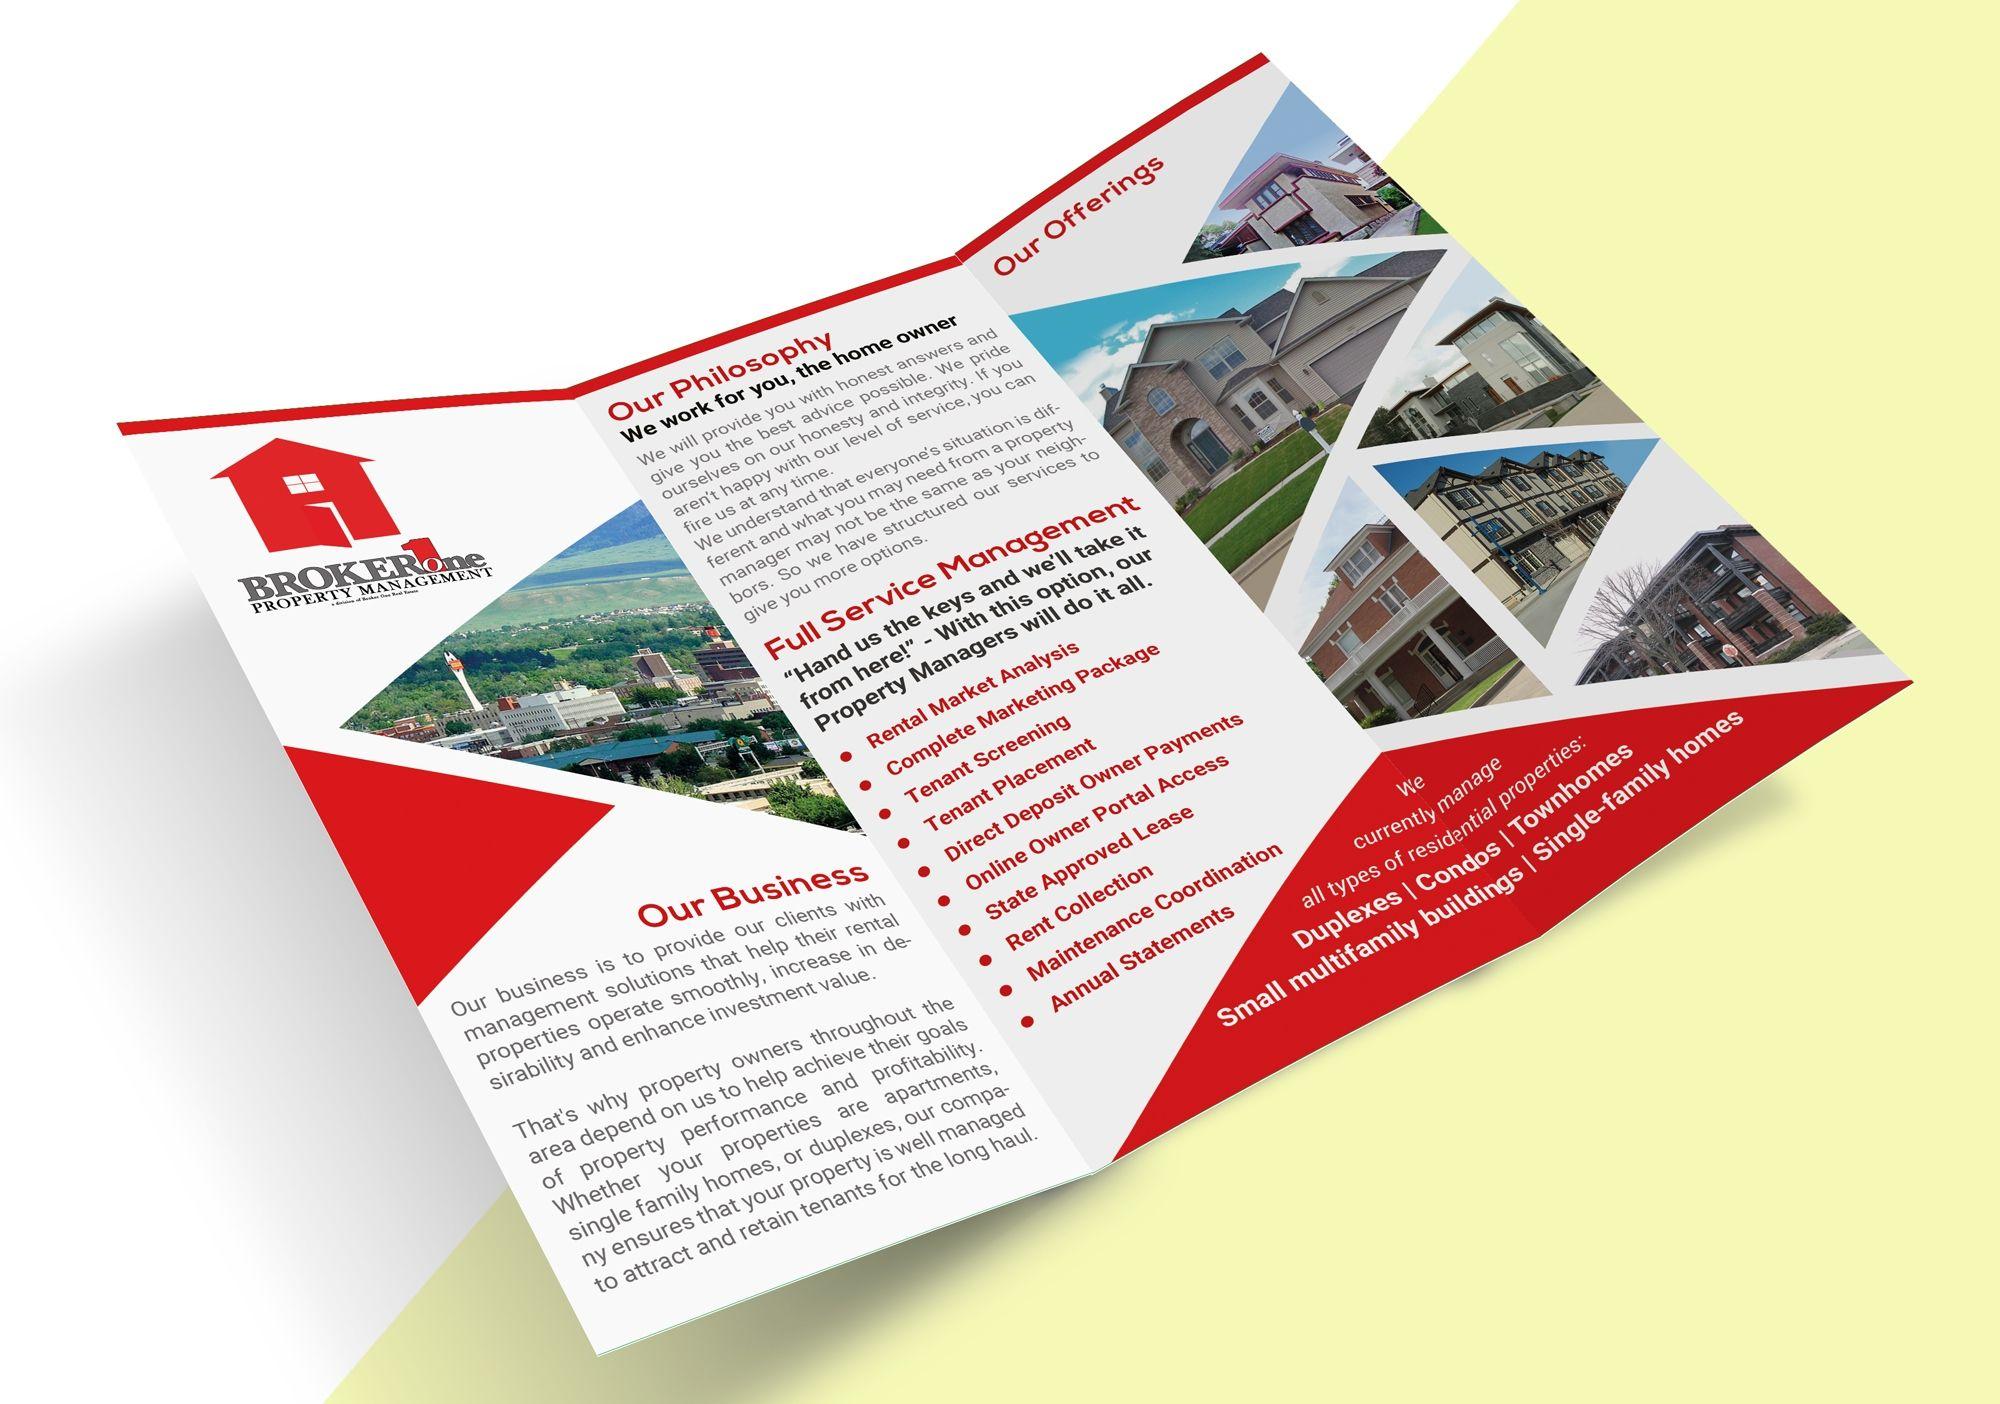 Designs Real Estate Company Needs Eye Catching Property Management Pamphlets Postcard Flyer Or Print C Property Management Real Estate Companies Postcard